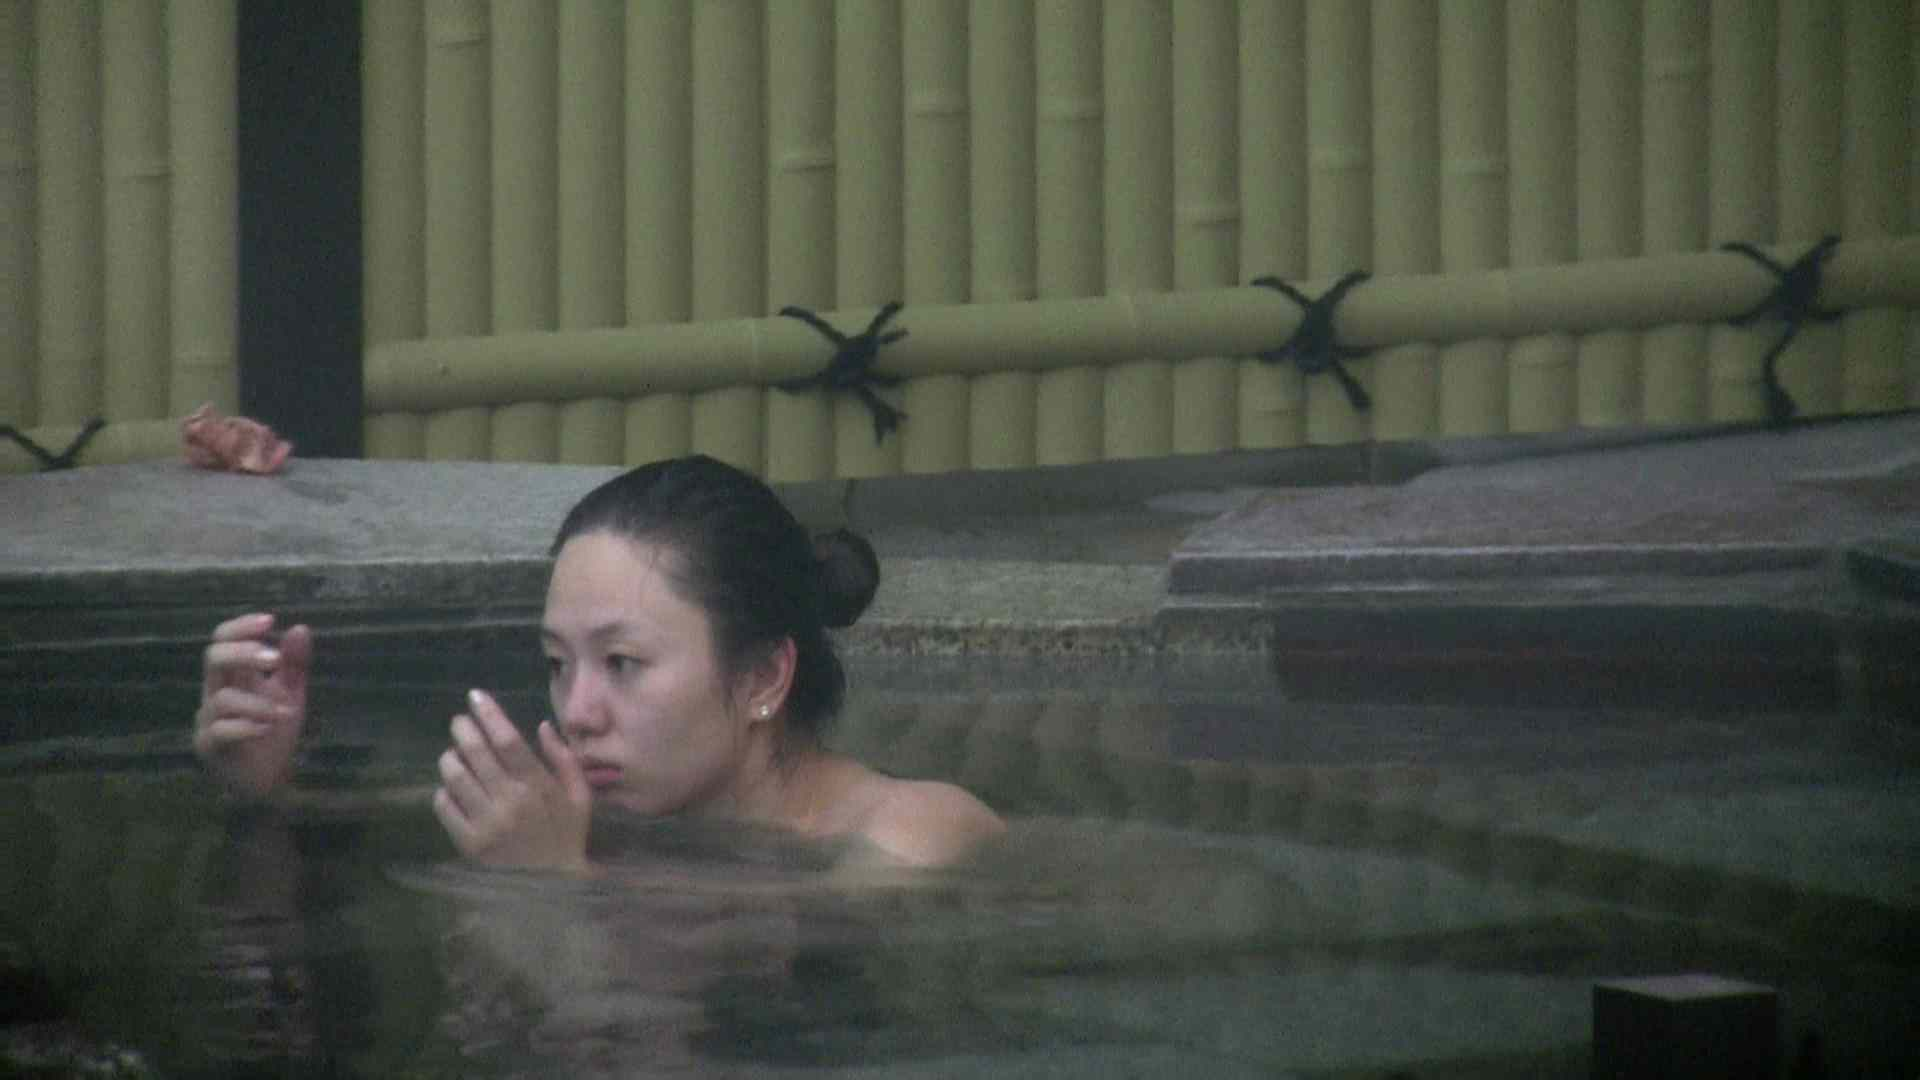 Aquaな露天風呂Vol.586 露天   HなOL  58pic 3